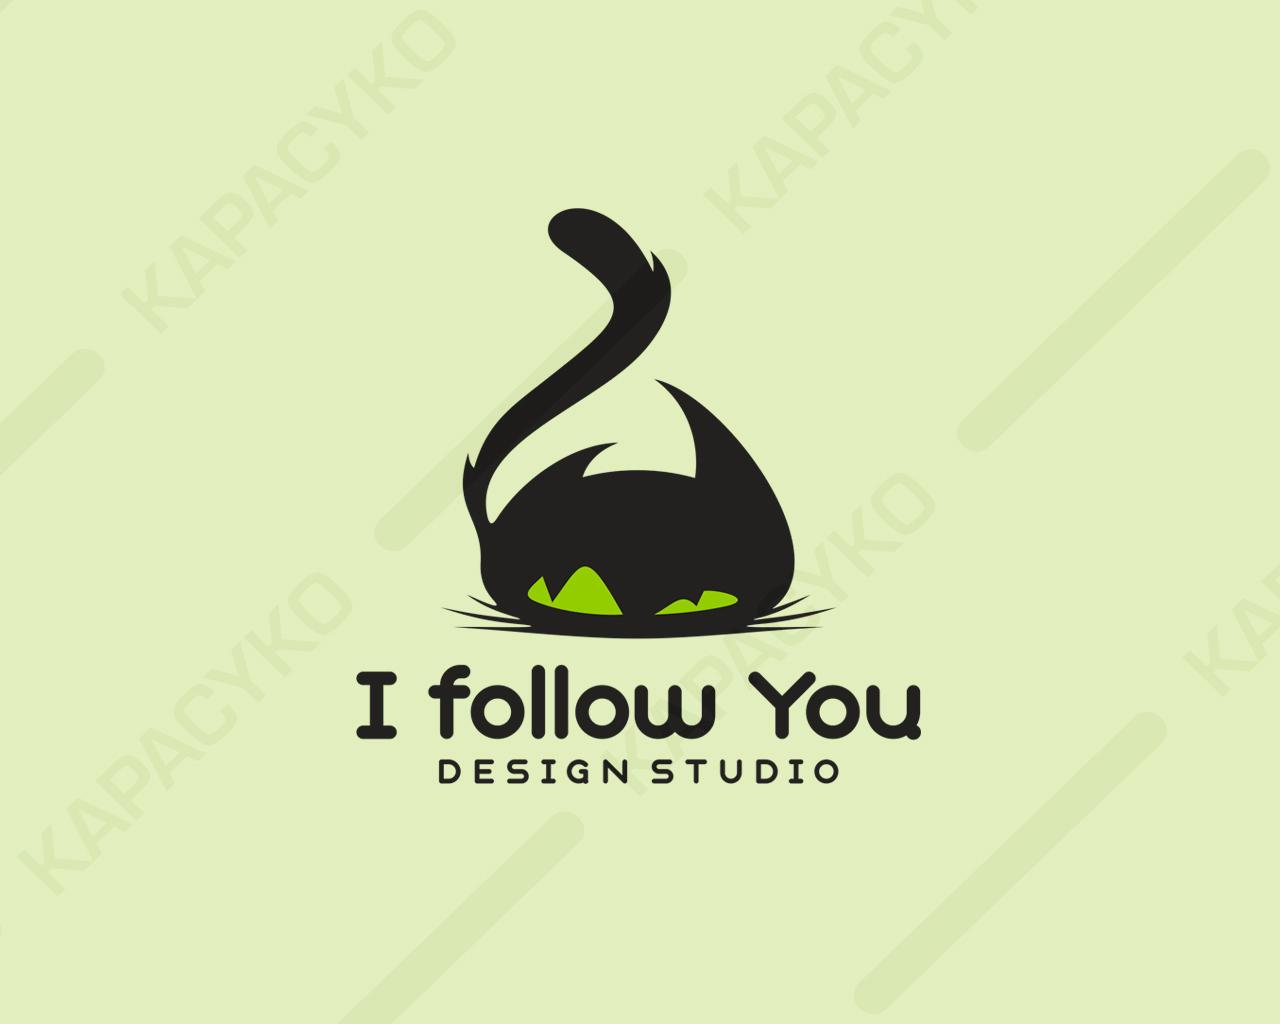 Professional  Creative Logo Design by Kapacyko on Envato Studio